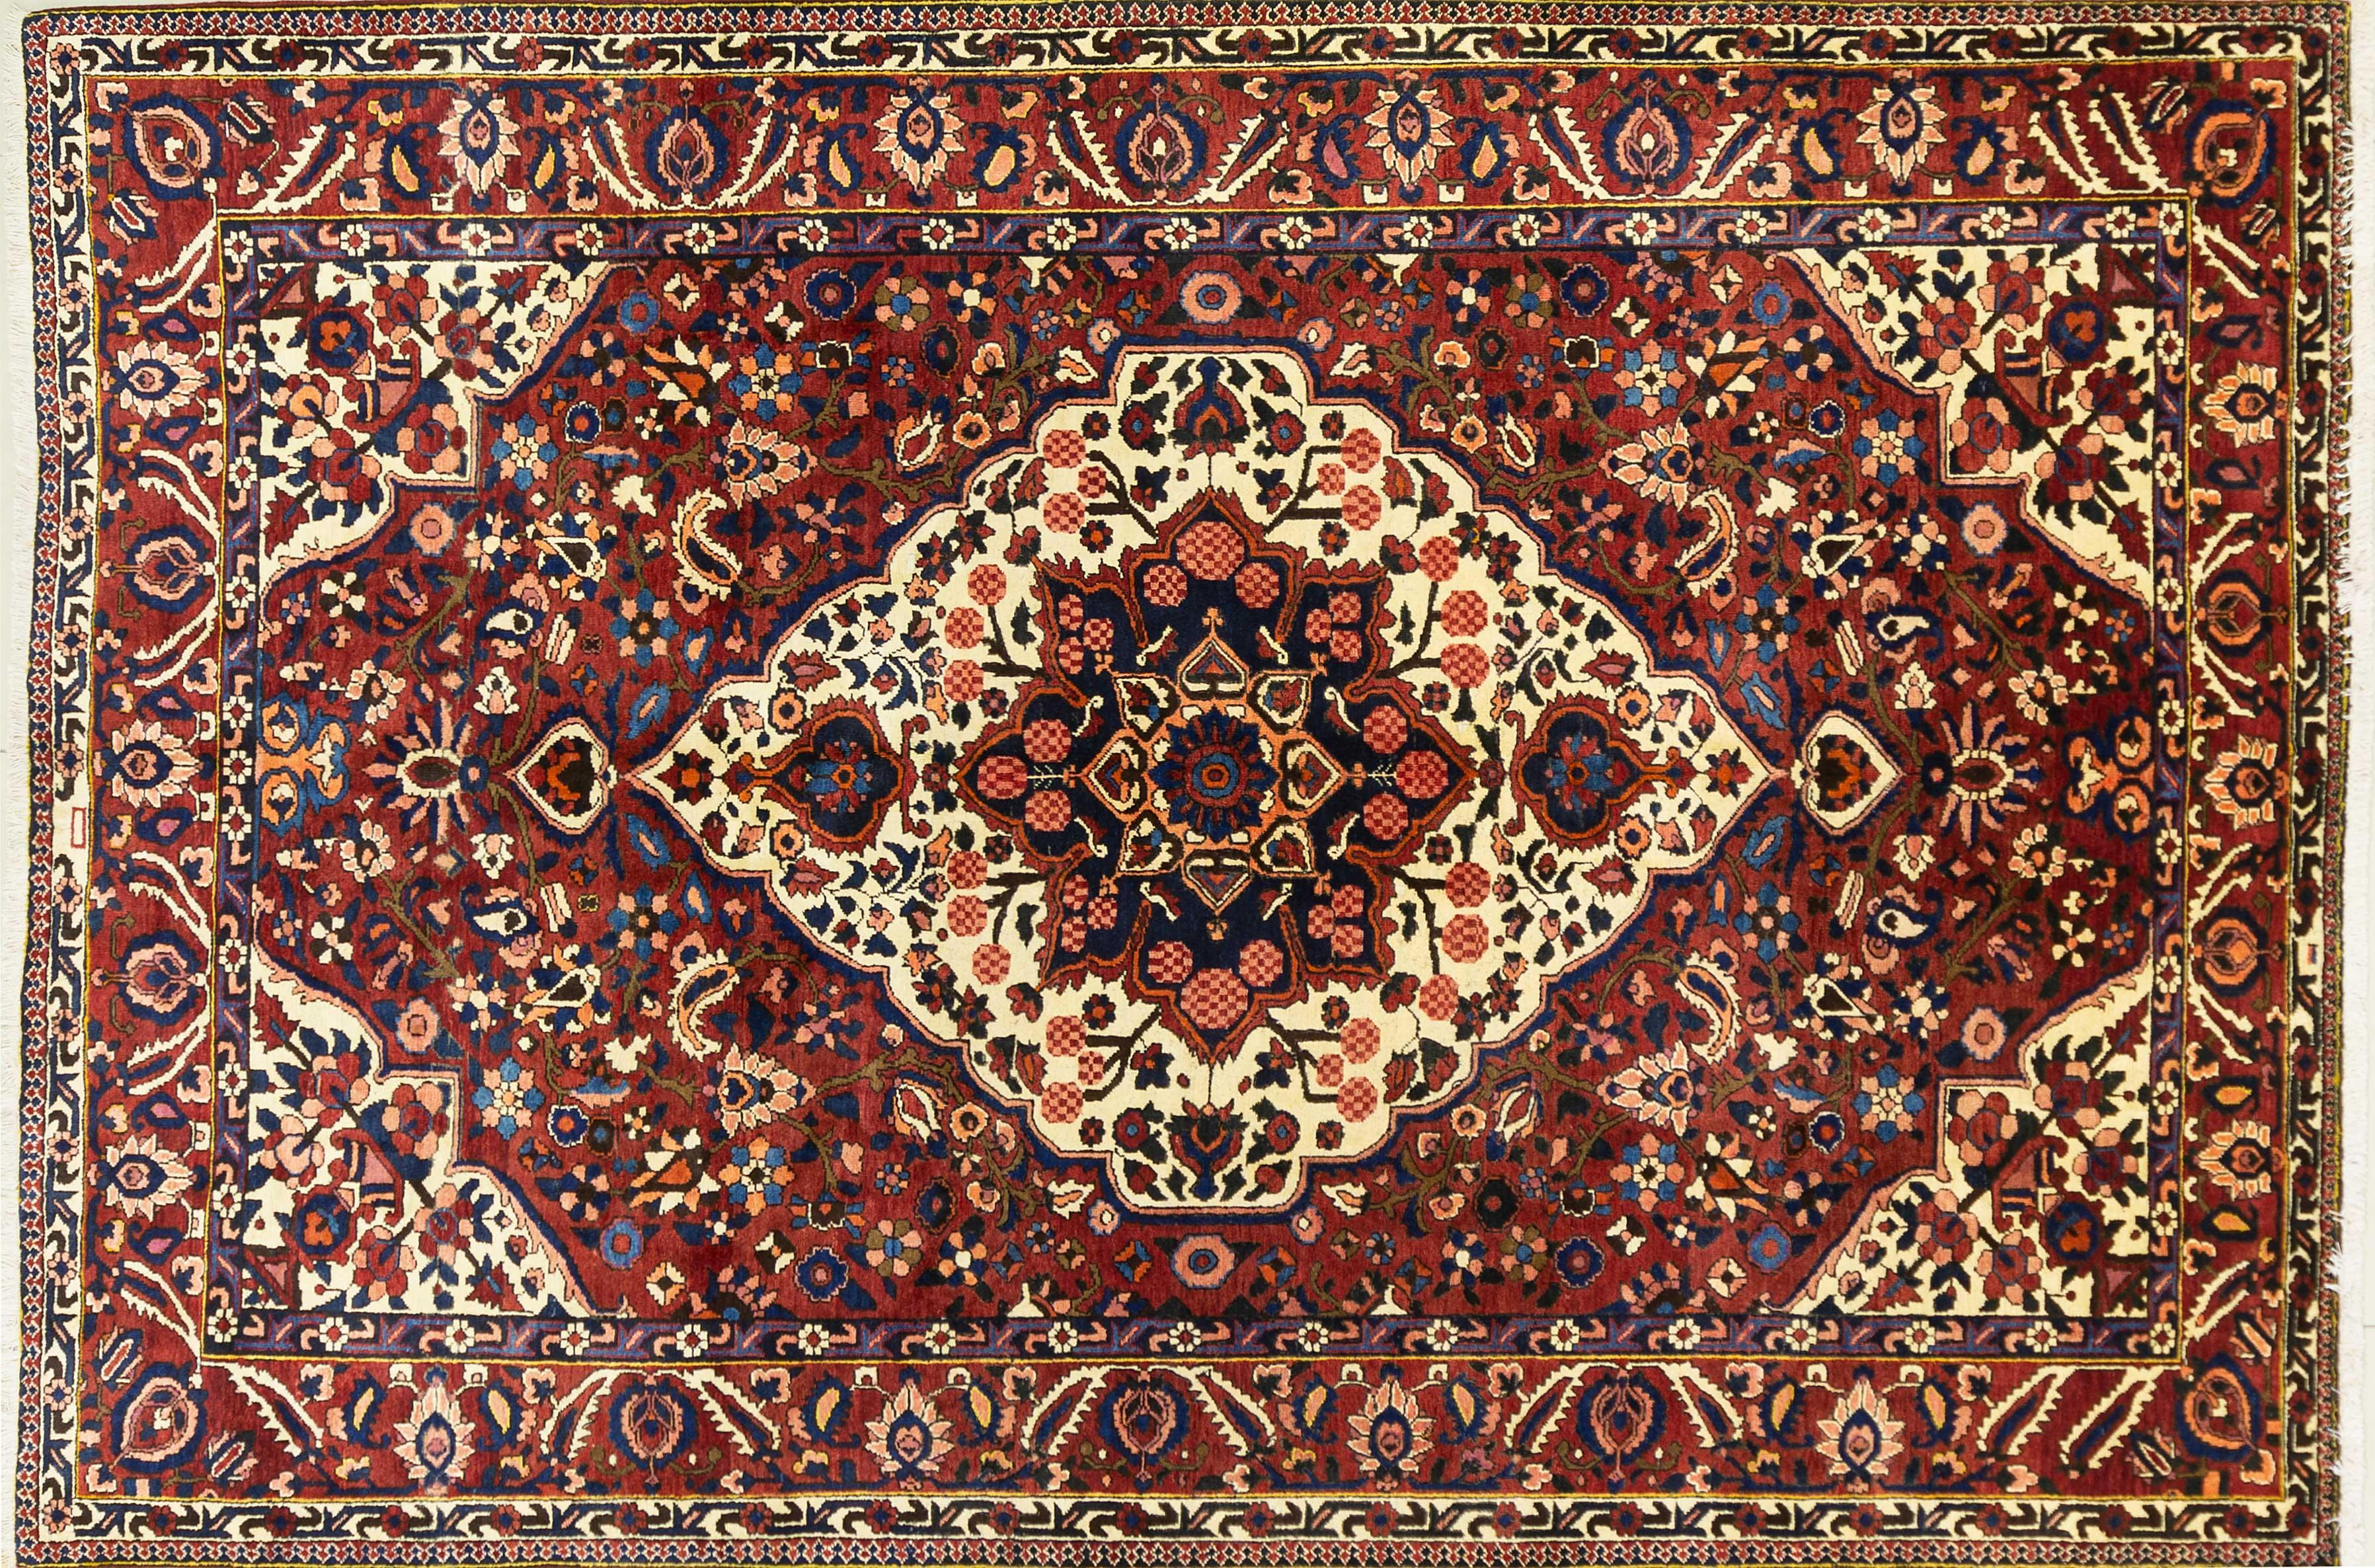 A Persian Hand Knotted Bakhtiari Carpet, 314 x 213